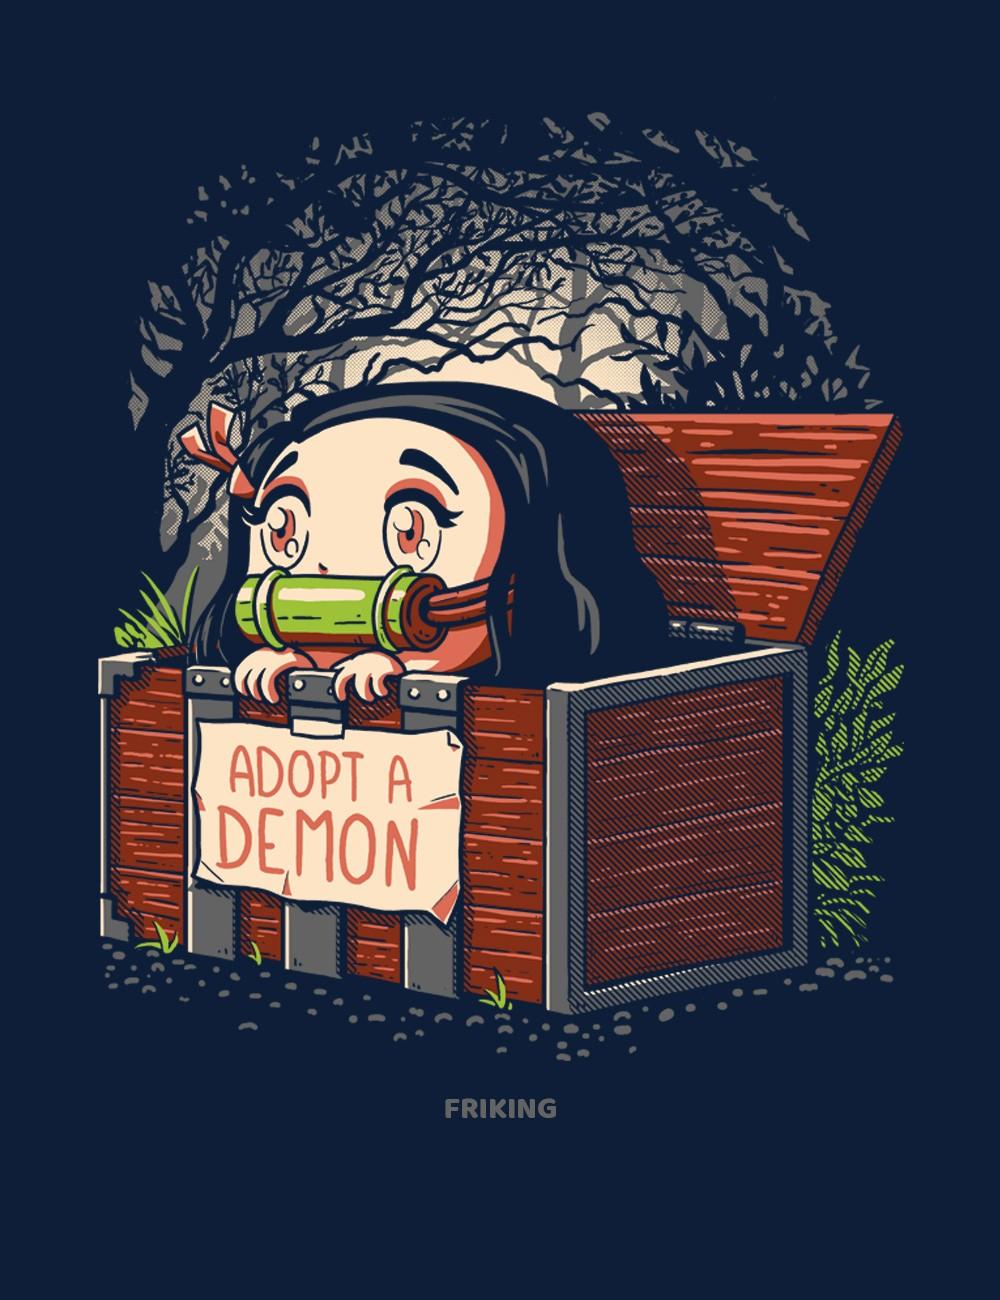 Adopt a demon